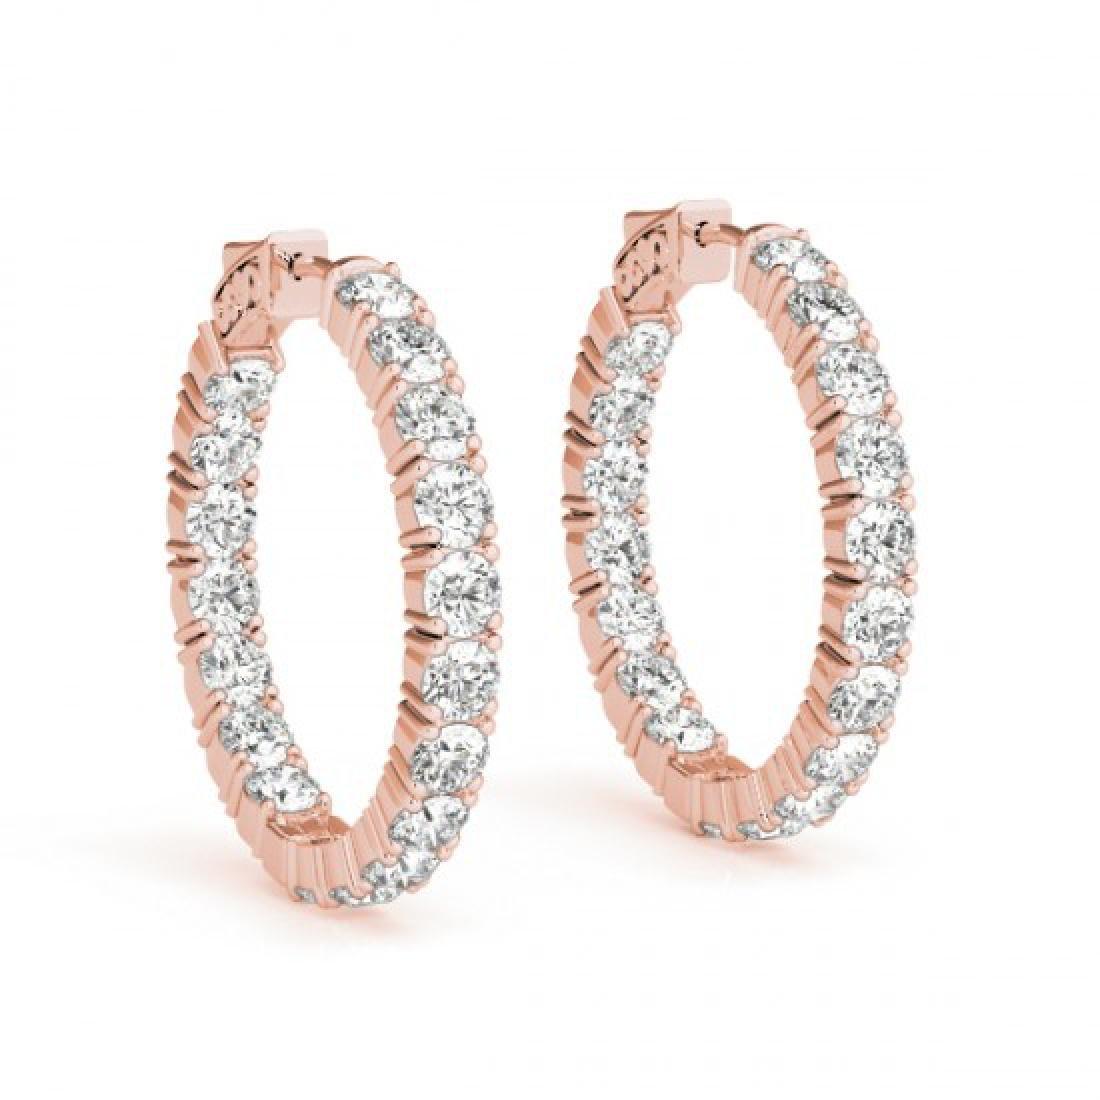 5 CTW Diamond VS/SI Certified 21 Mm Hoop Earrings 14K - 2